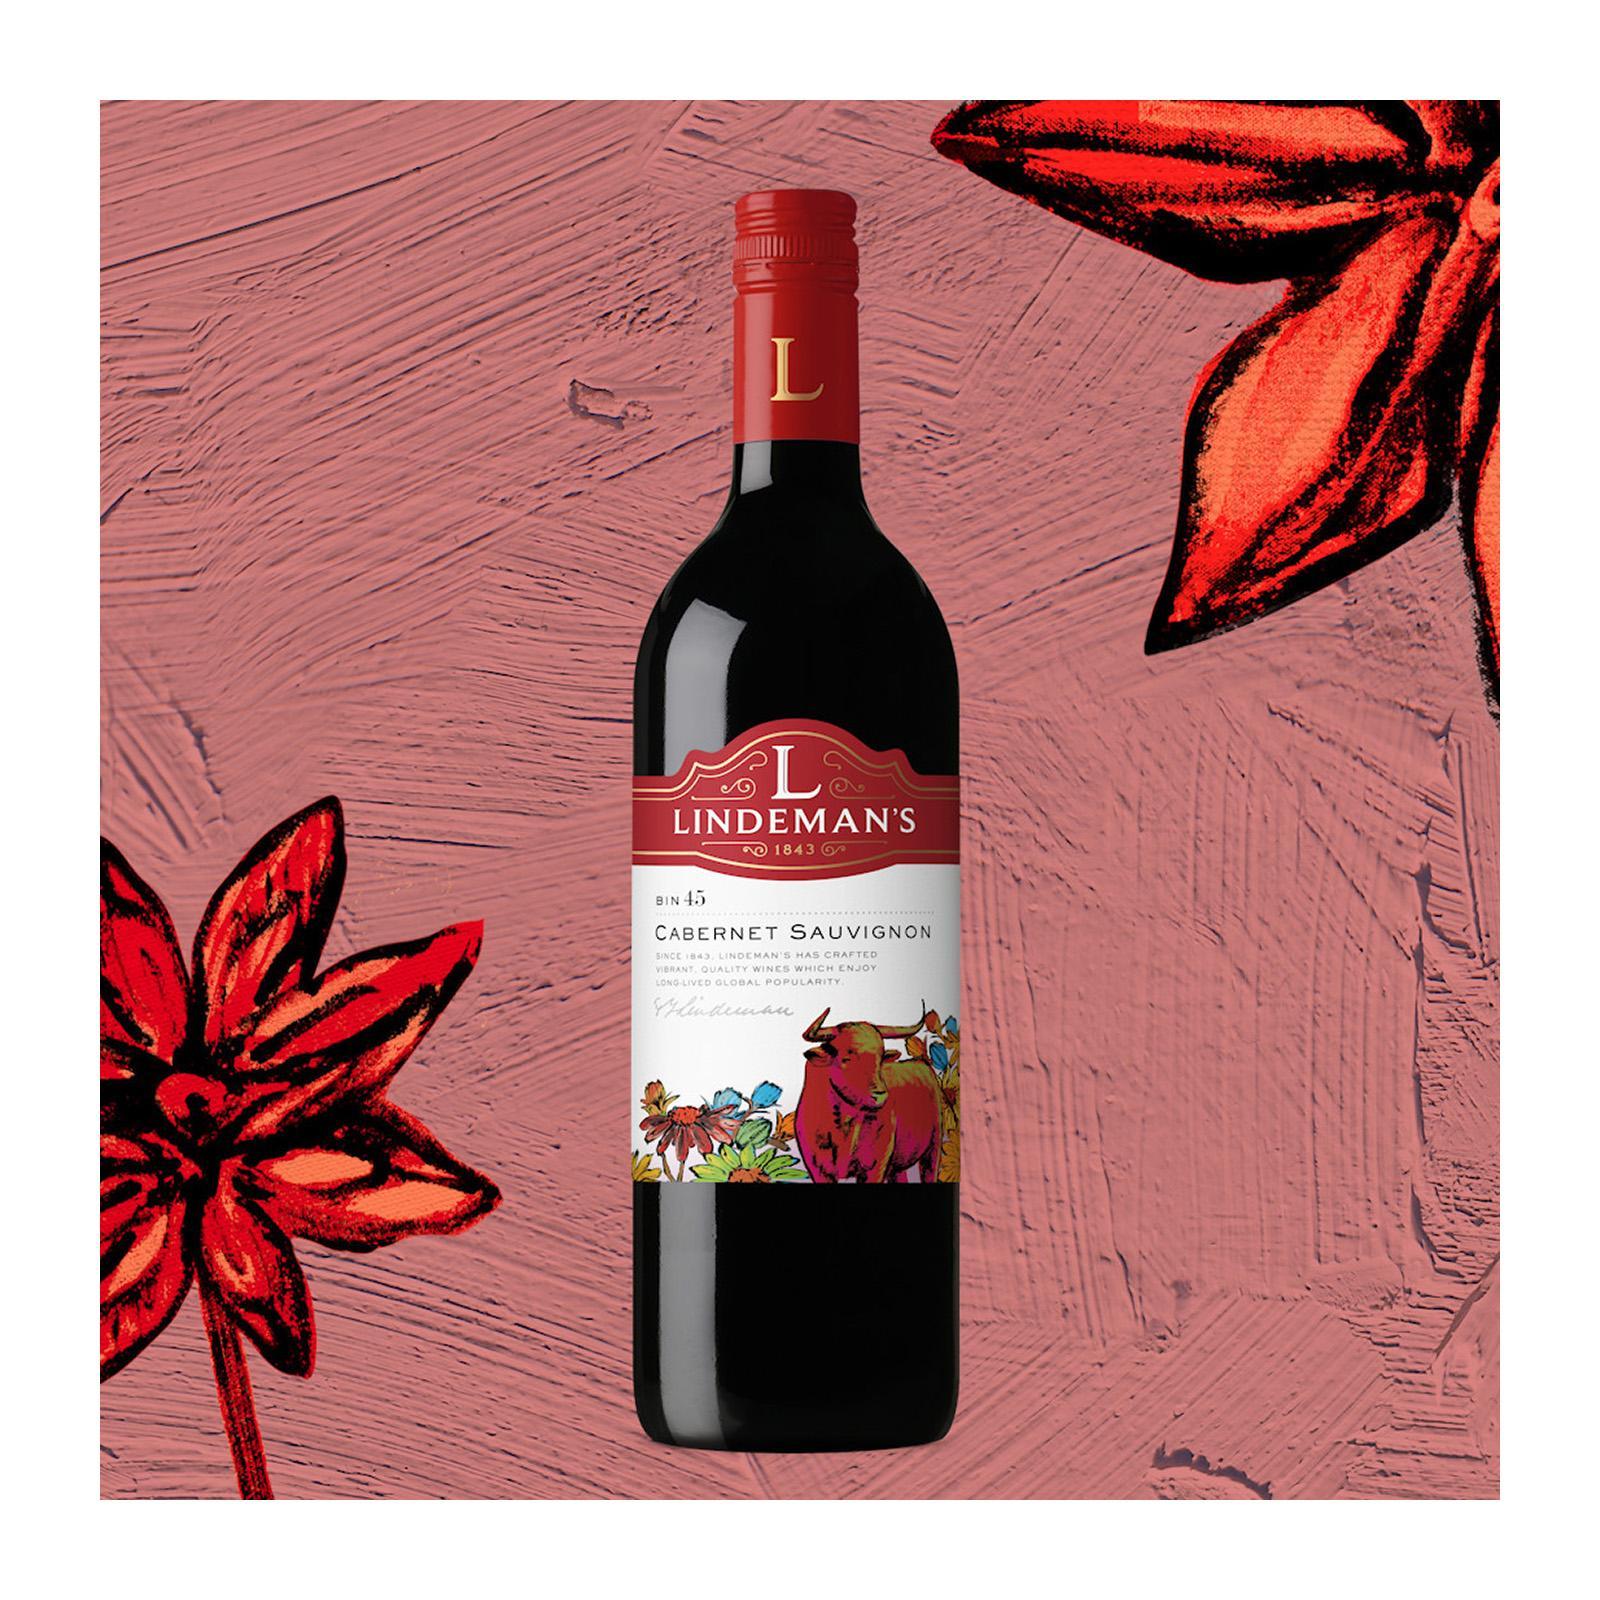 Lindeman's Bin 45 Cabernet Sauvignon Red Berry Flavour | Lazada Singapore